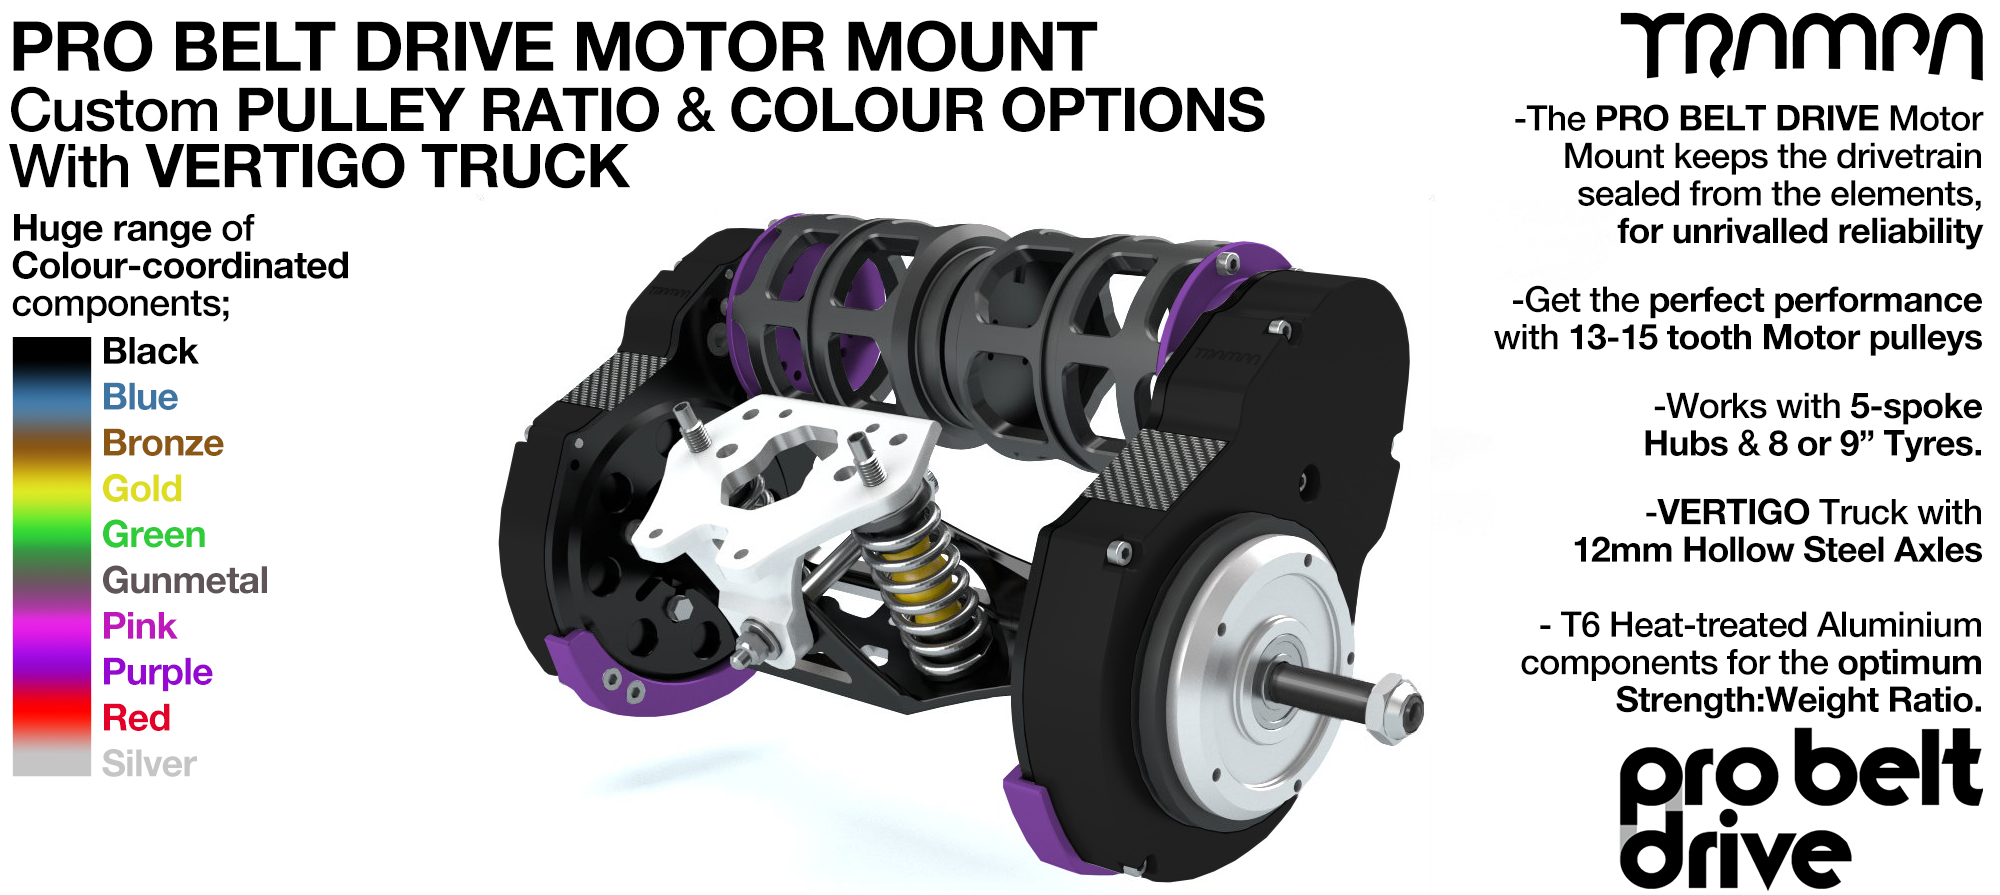 Mountainboard PRO Belt Drive TWIN Motor Mounts & Precision VERTIGO Truck